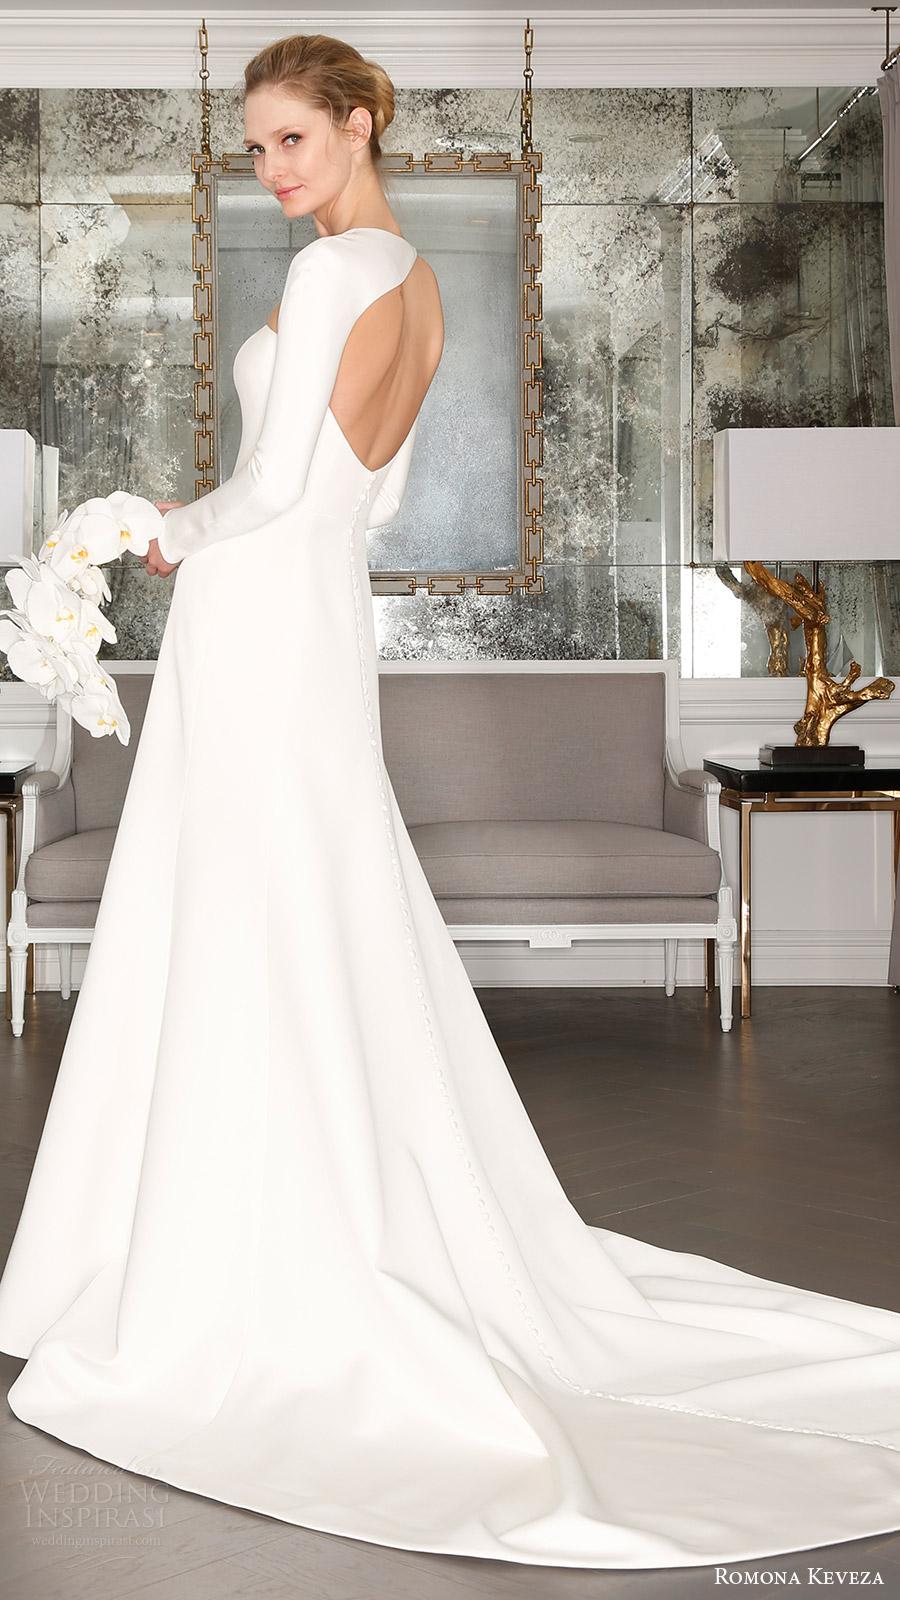 romona keveza bridal spring 2017 strapless straightacross trumpet wedding dress (rk7402) bv train optional long sleeve shrug